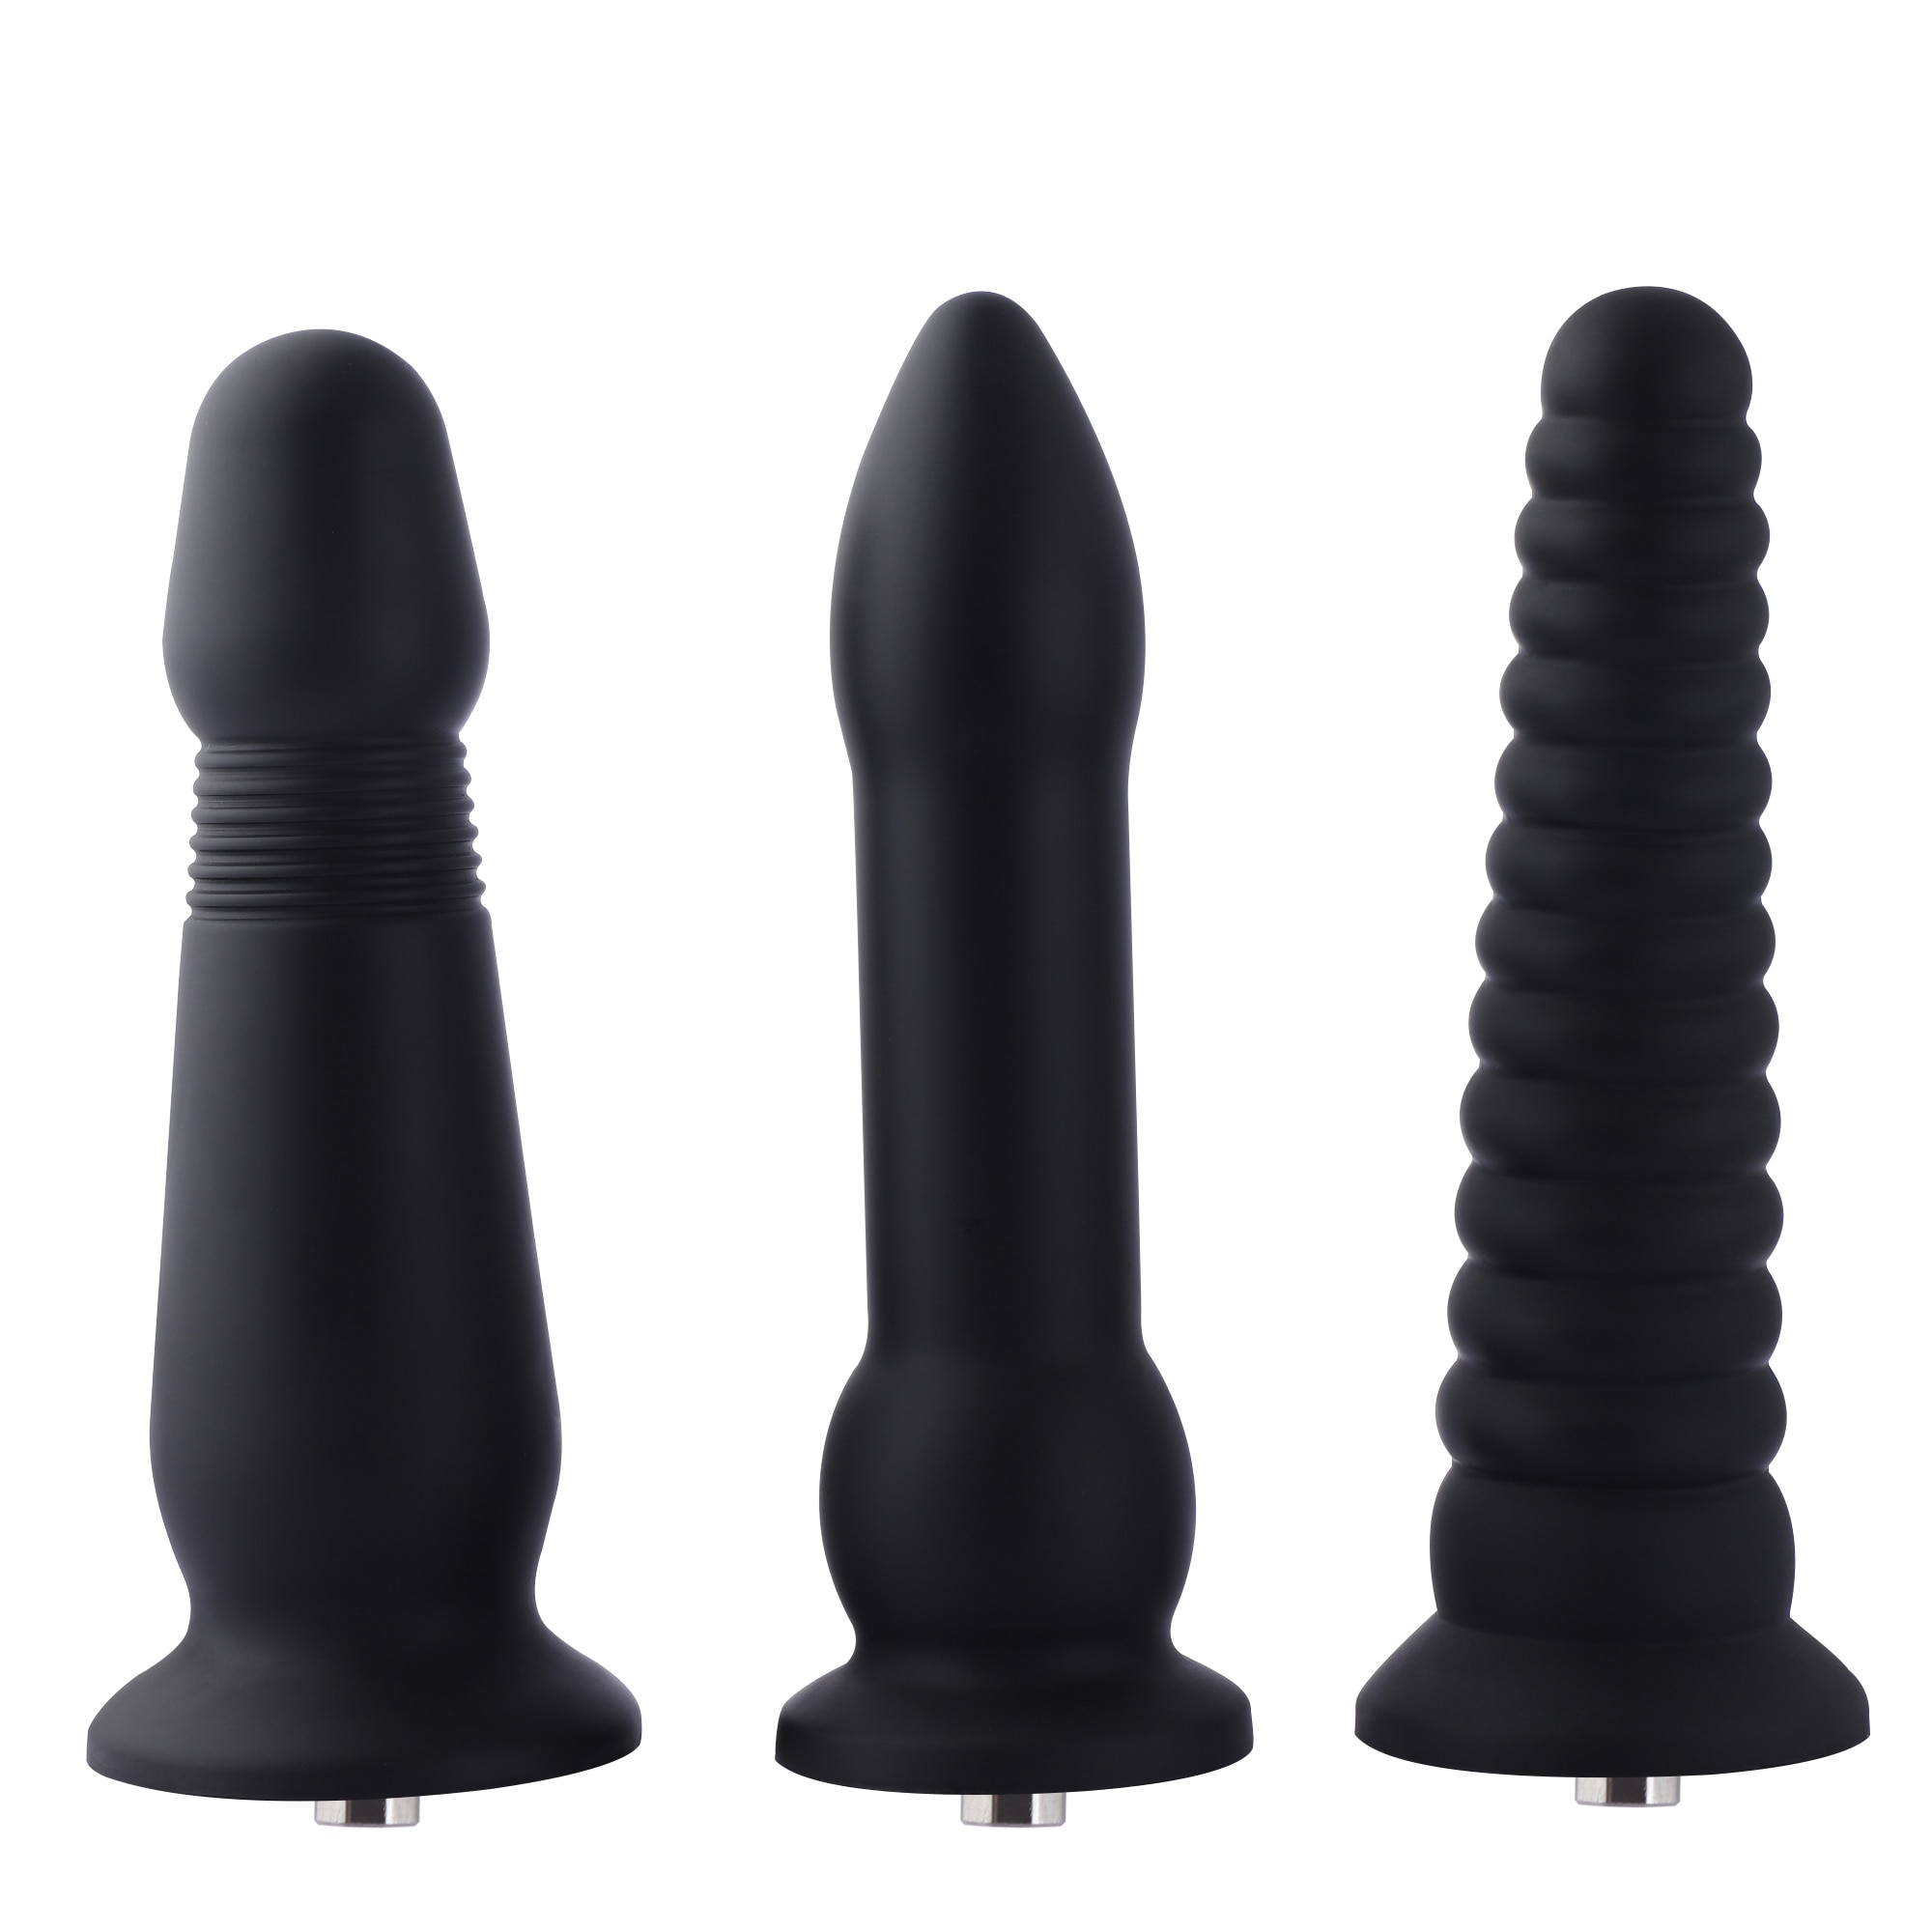 Hismith-قابس شرجي سيليكون 25 سنتيمتر مع klicluke ، قابس شرجي كبير لآلة الجنس Hismith Premium ، قضيب شرجي أسود طويل ، قابس شرجي